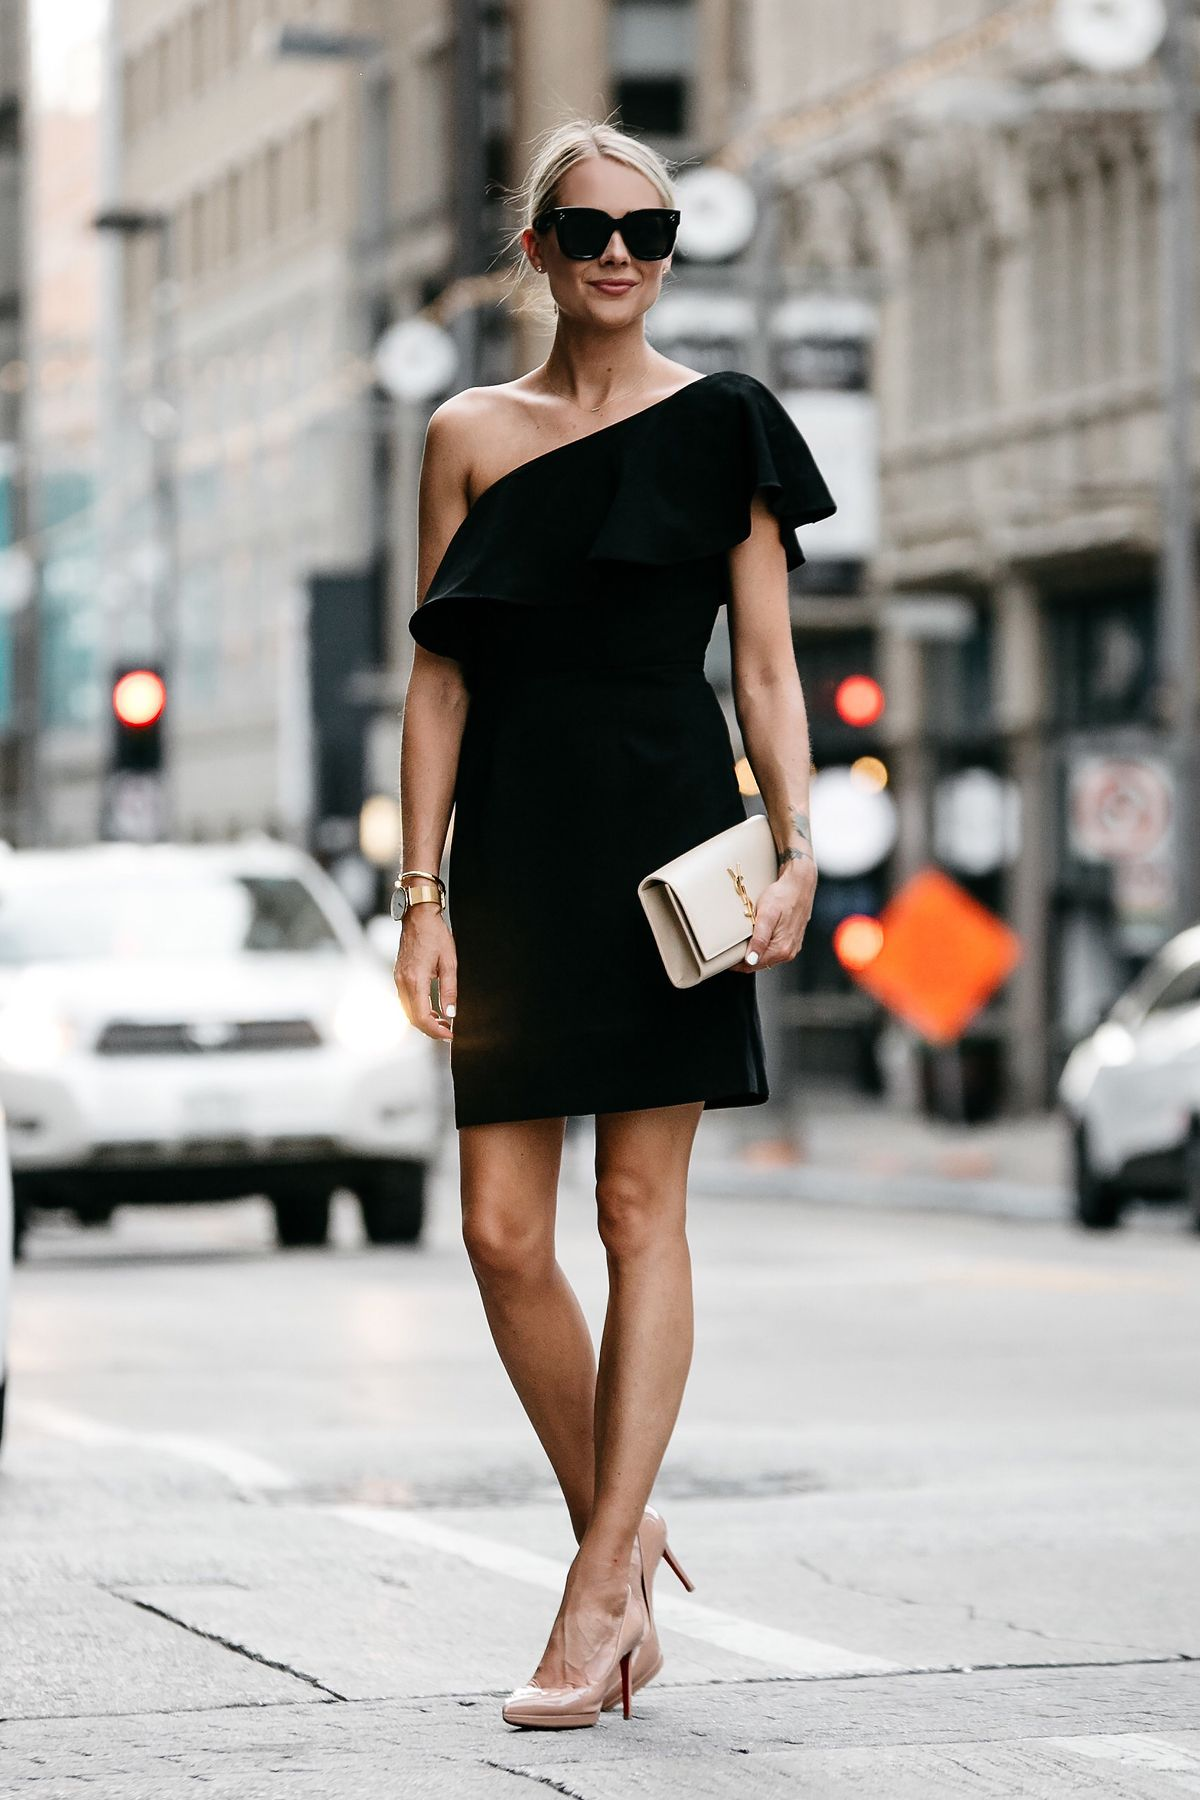 Wedding Season Is Upon Us And Nothing Beats A Classic Black Dress This Black One Shoulder Ruffle Dress Fashion Jackson Womens Fashion Women S Fashion Dresses [ 1800 x 1200 Pixel ]